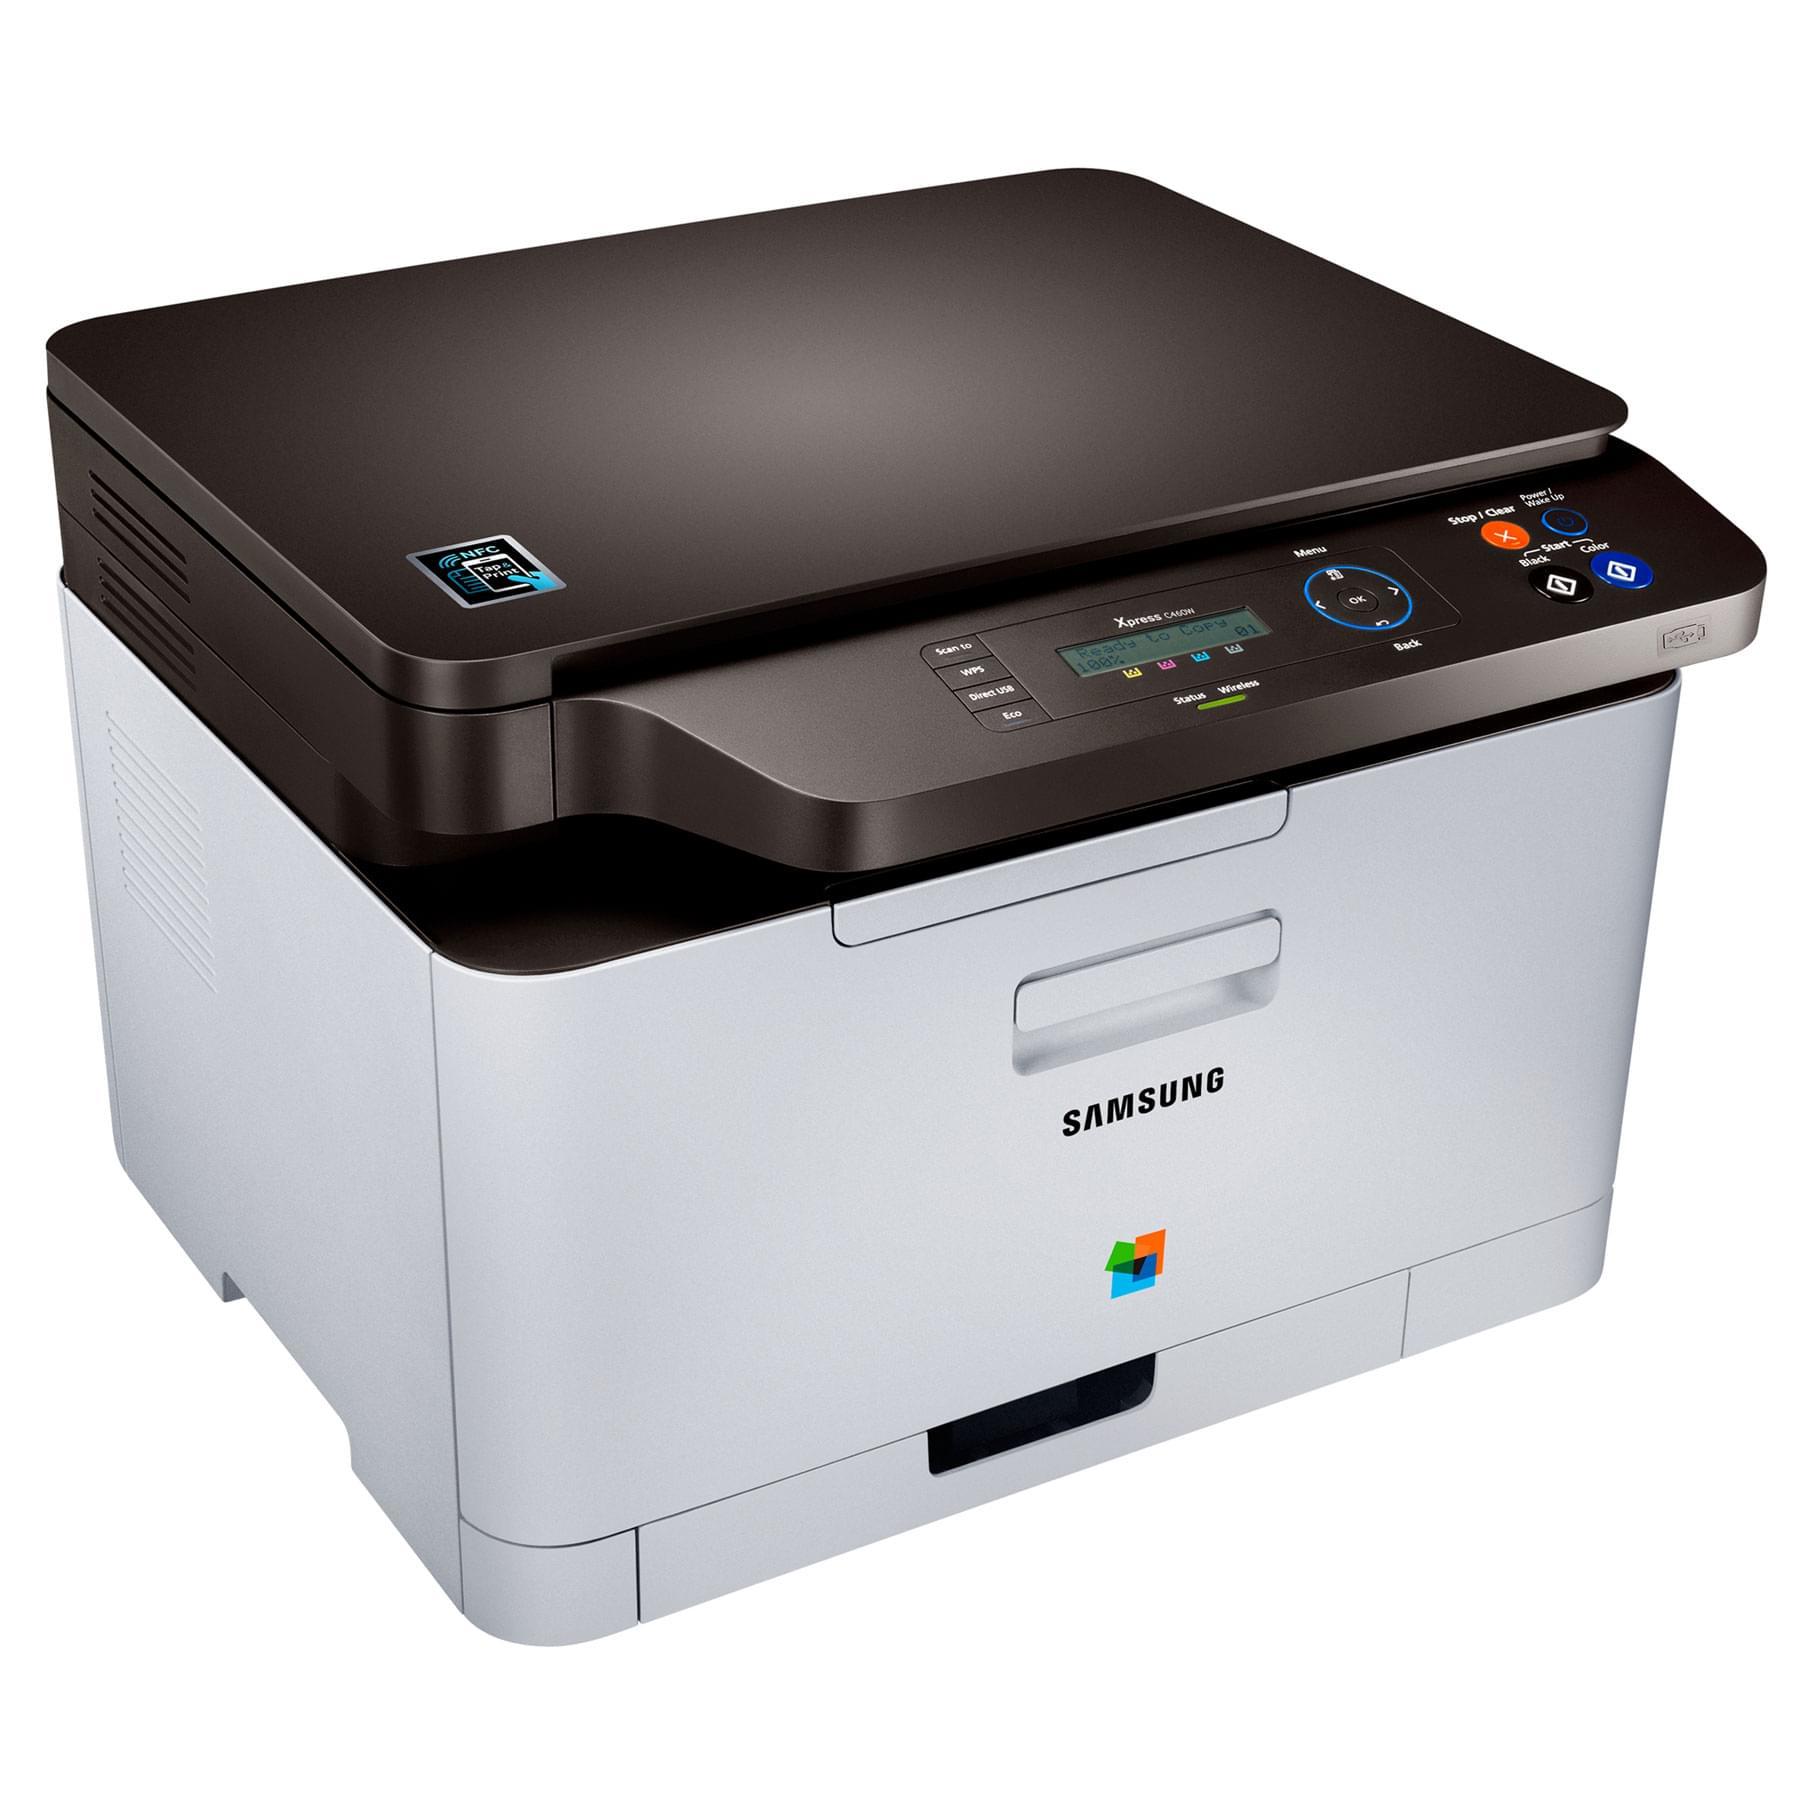 Imprimante multifonction Samsung SL-C460W - Cybertek.fr - 0